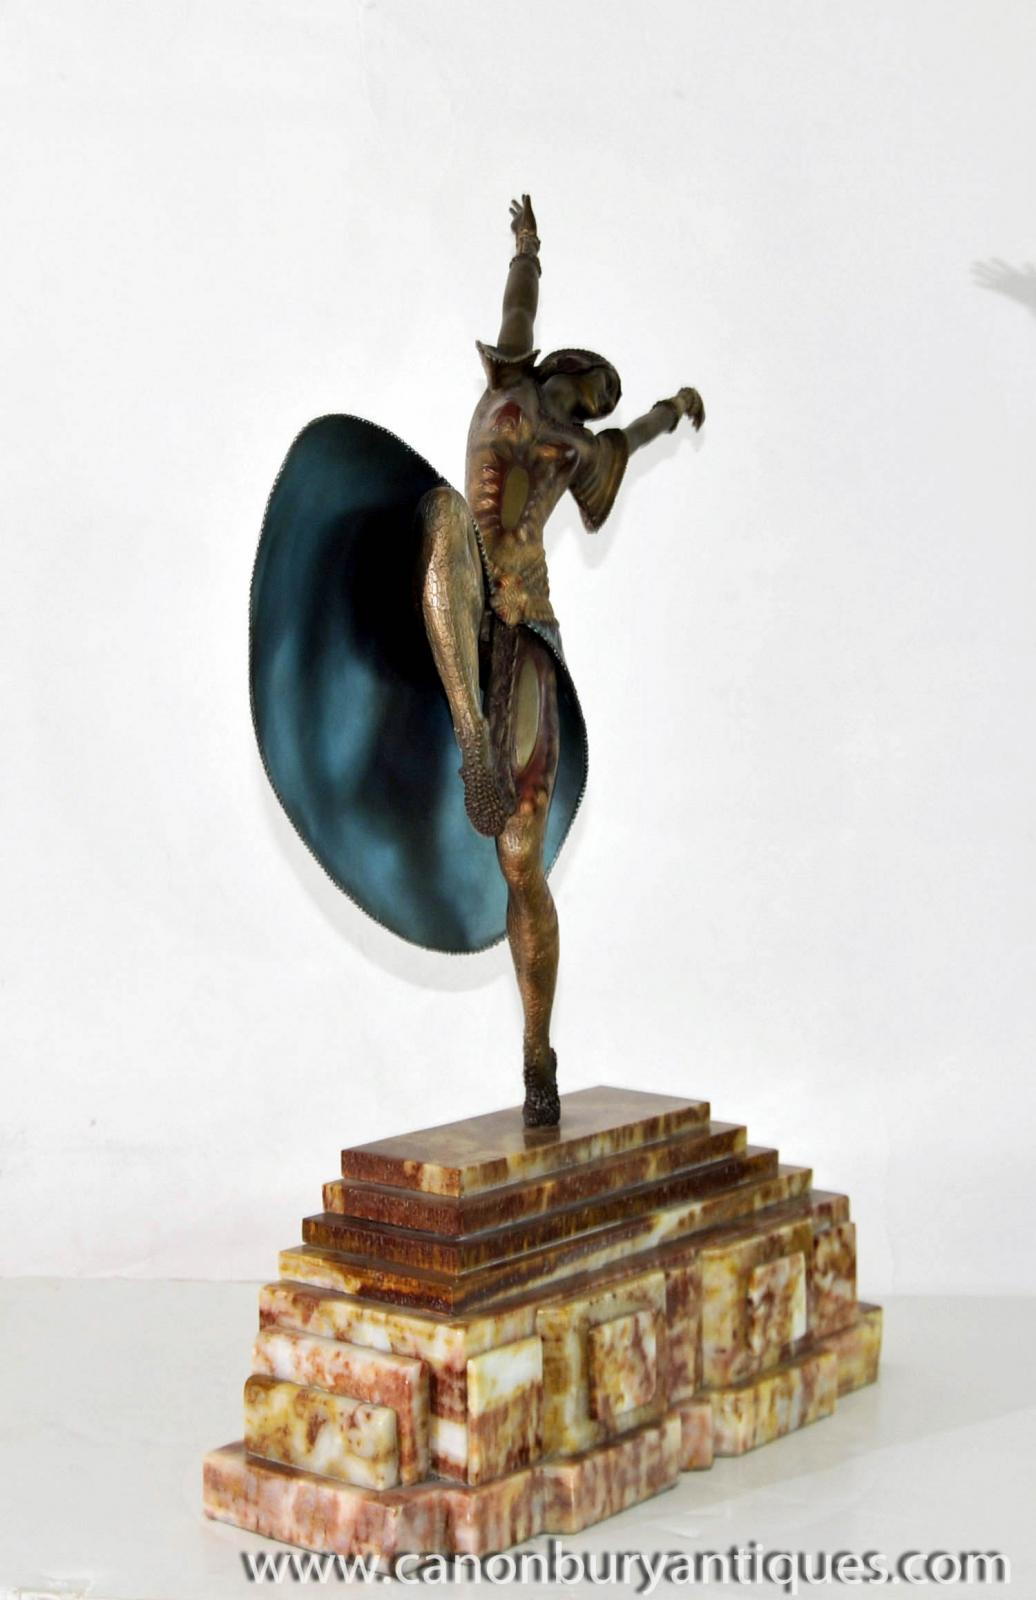 art deco bronze almeria statue by chiparus 1920s french figurine ebay. Black Bedroom Furniture Sets. Home Design Ideas